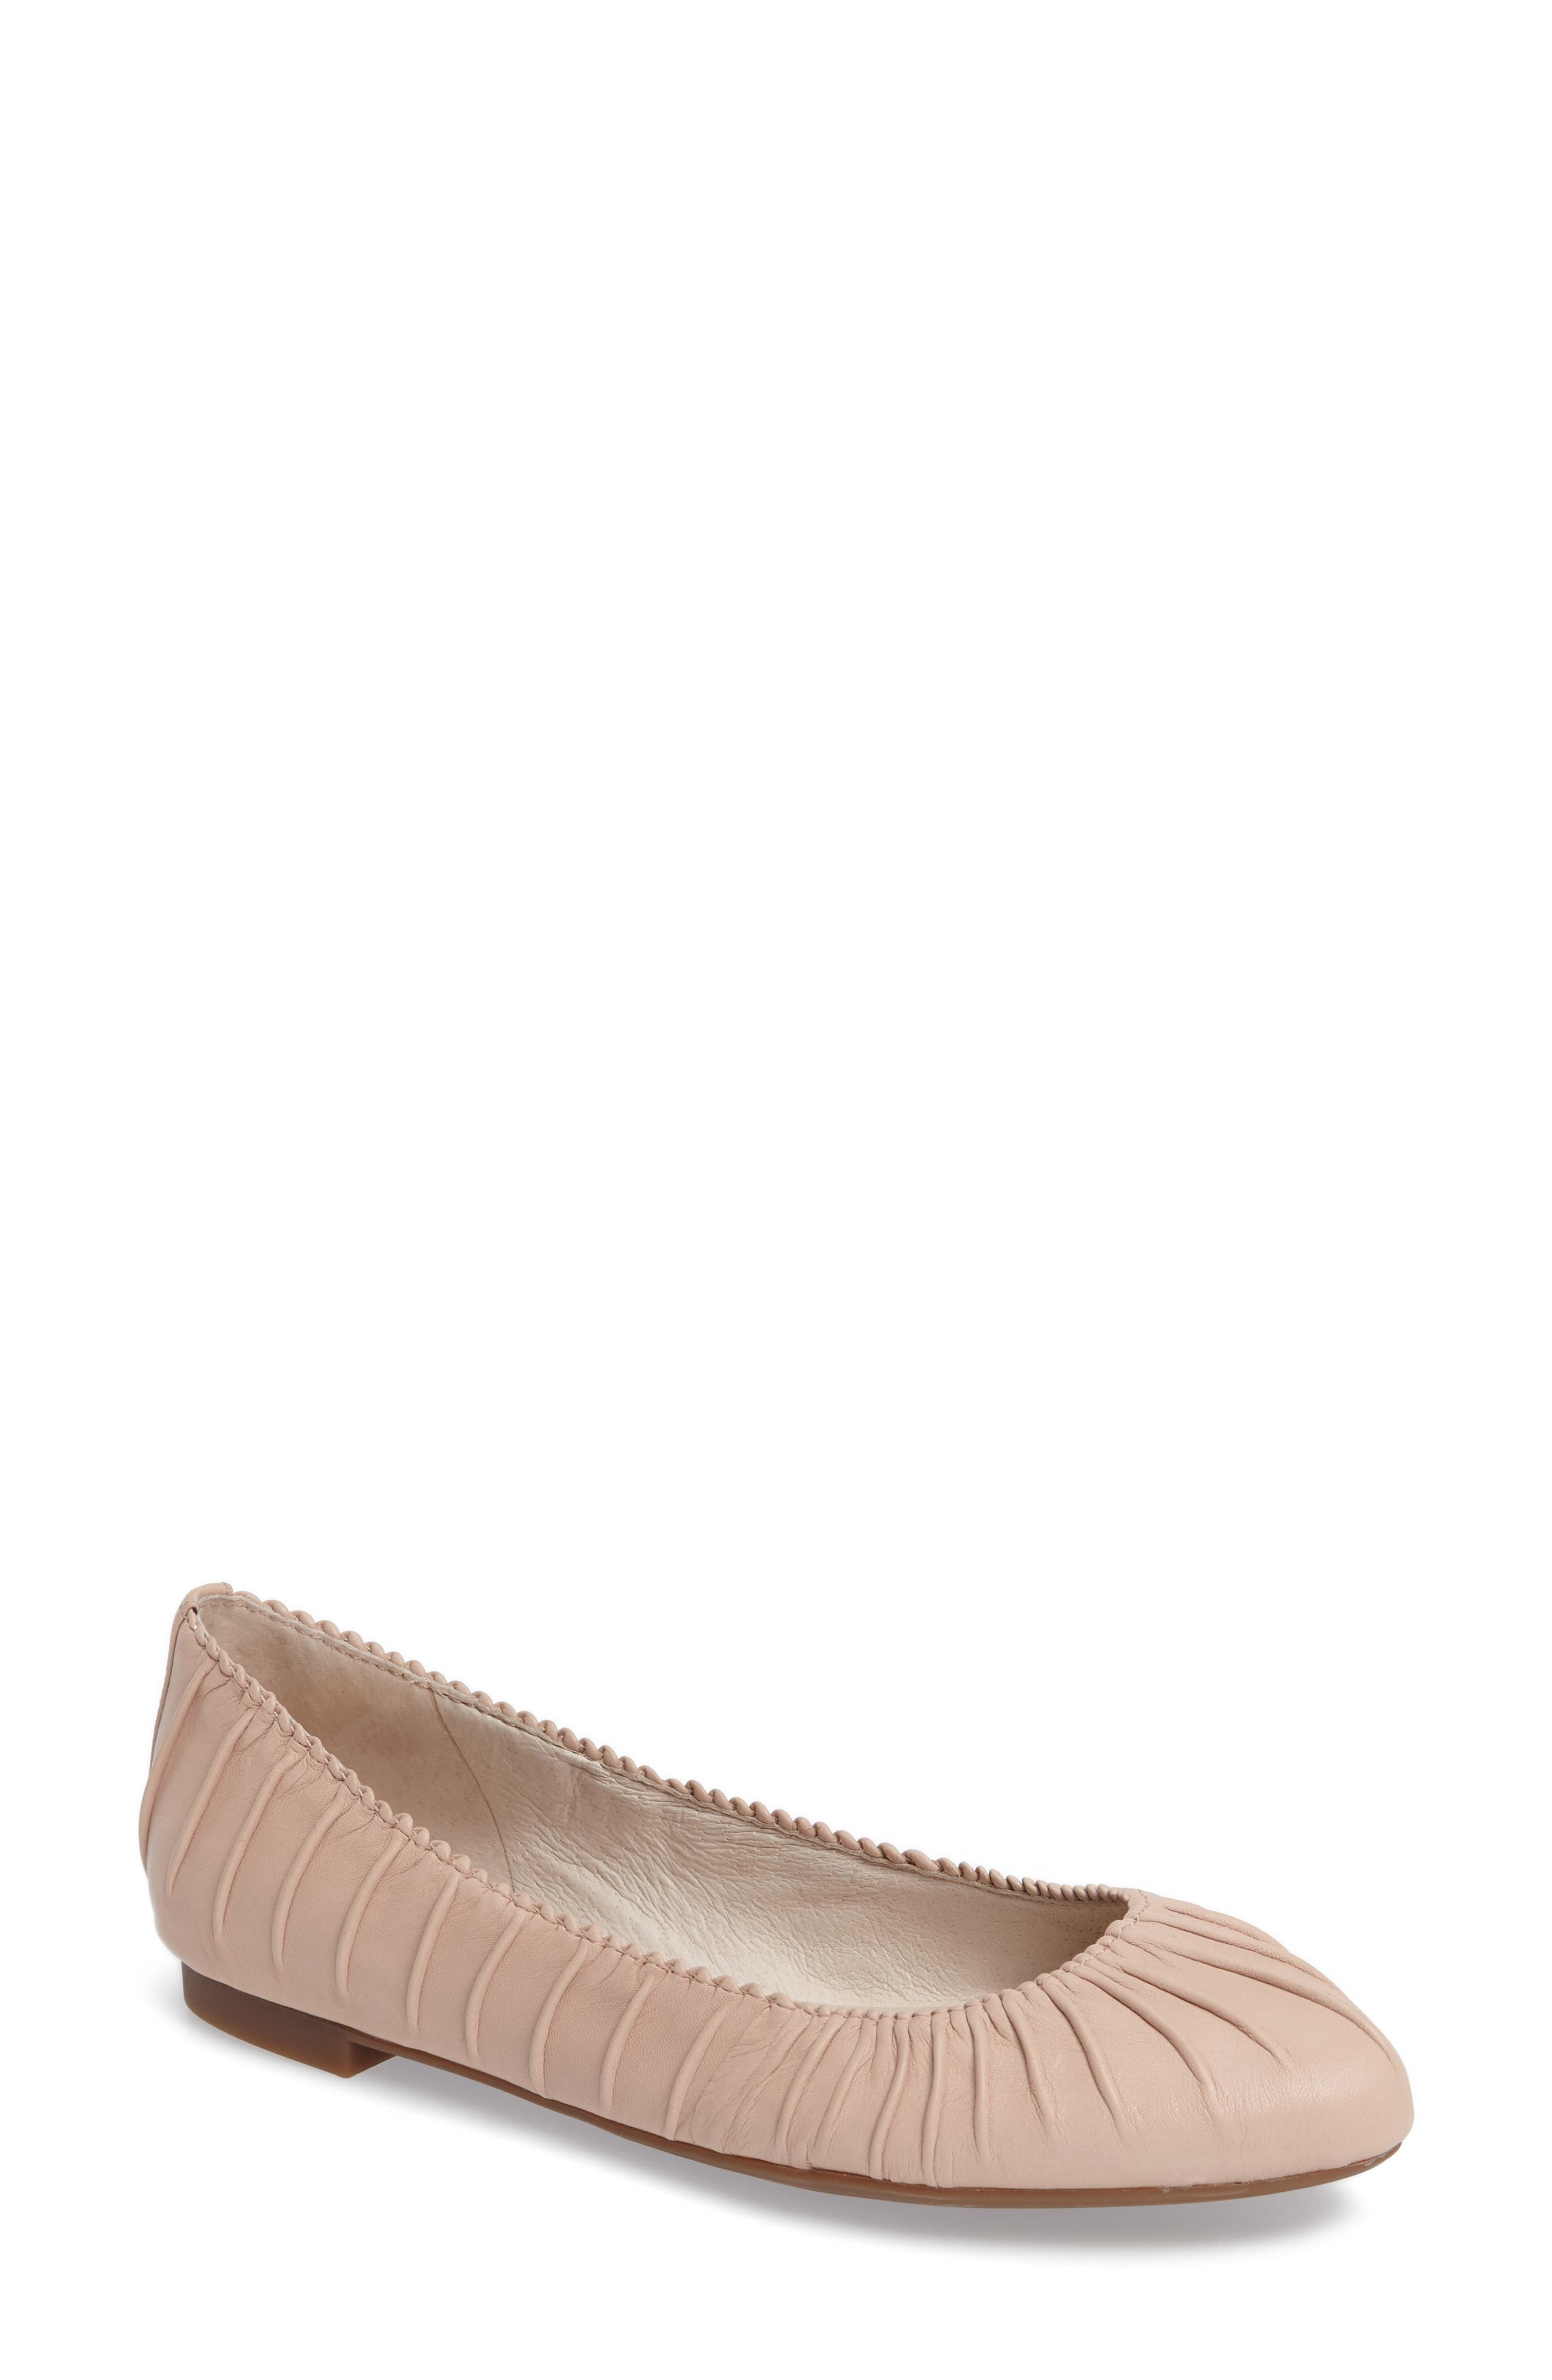 Louise et Cie Ashlin Ballet Flat (Women)